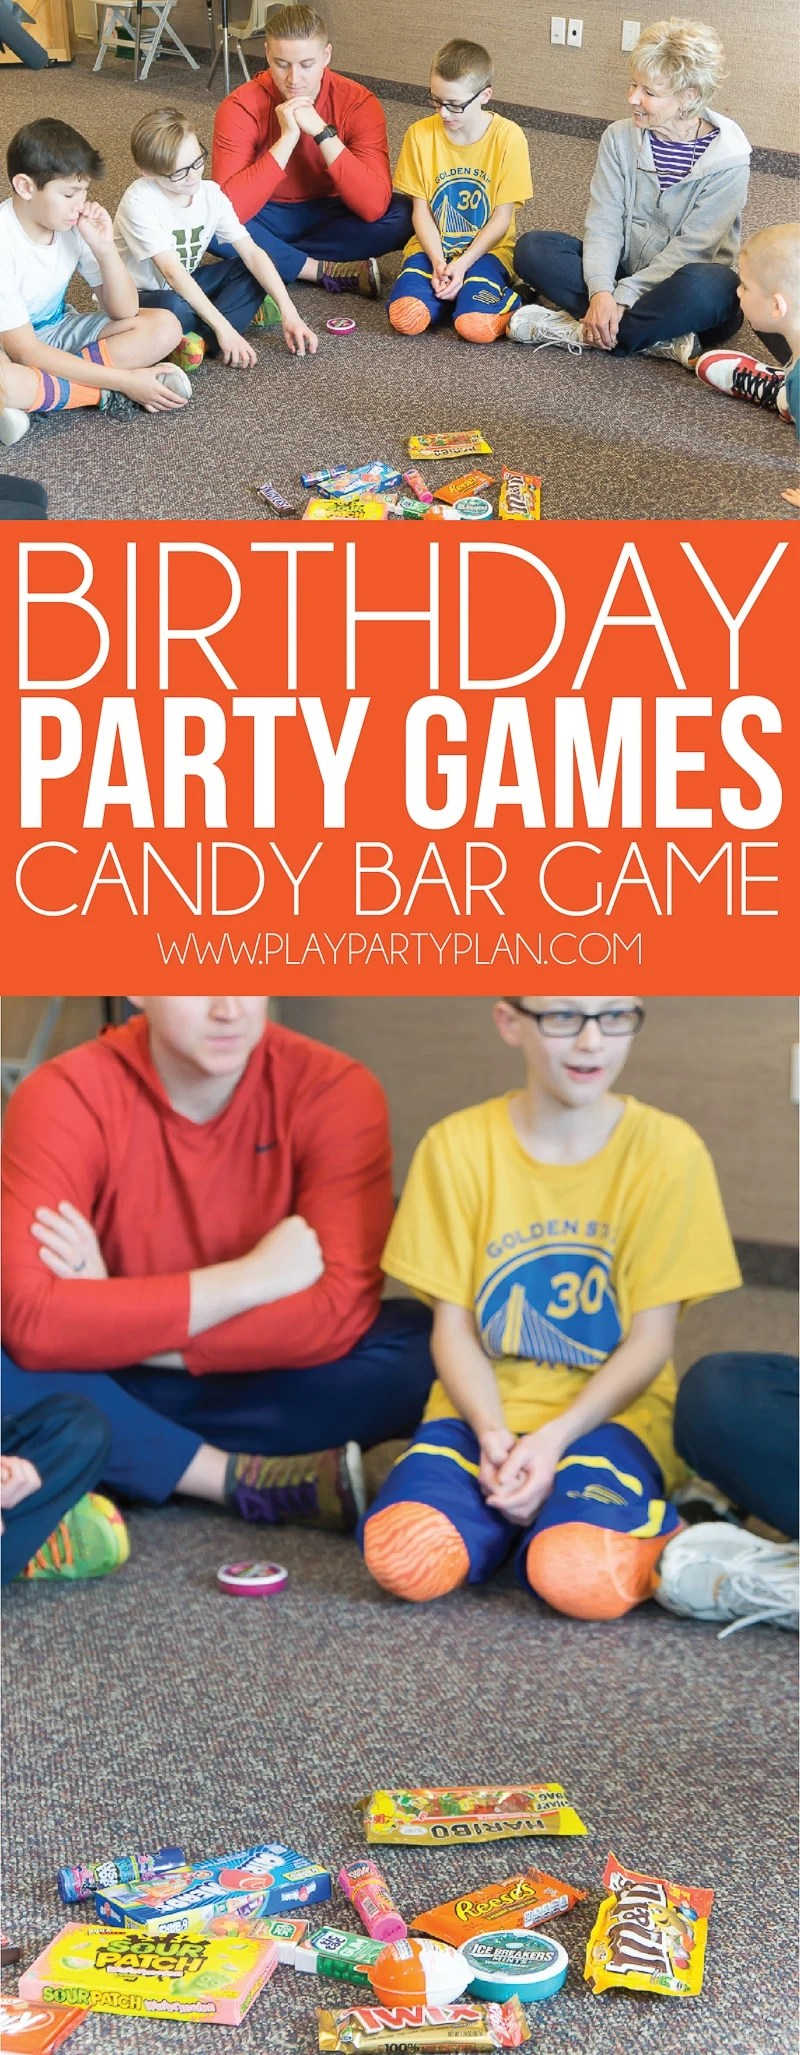 Fullsize Of Birthday Party Games